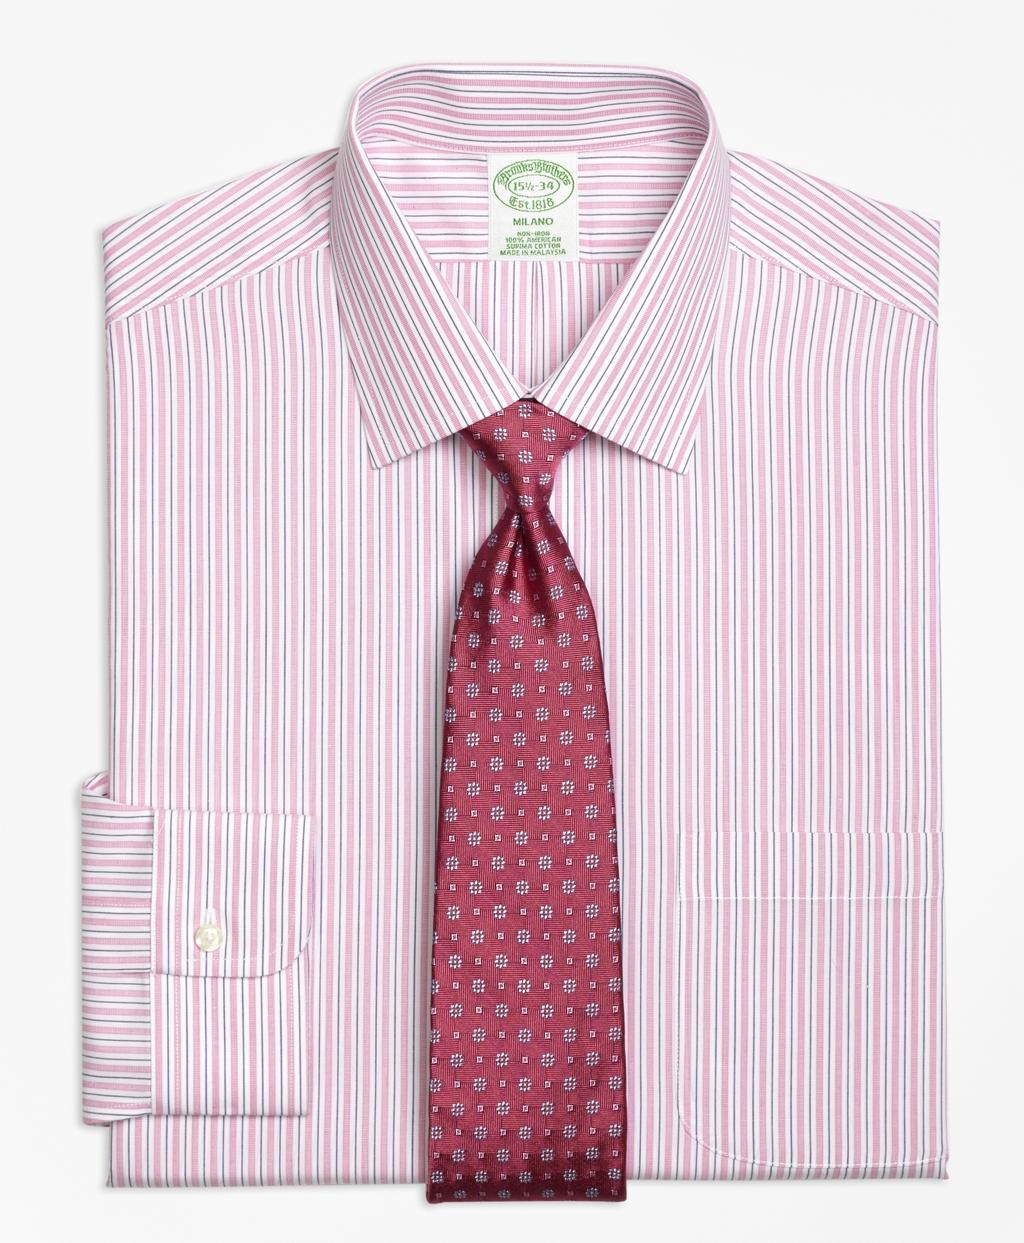 Brooks brothers non iron milano fit split stripe dress for Brooks brothers non iron shirts review